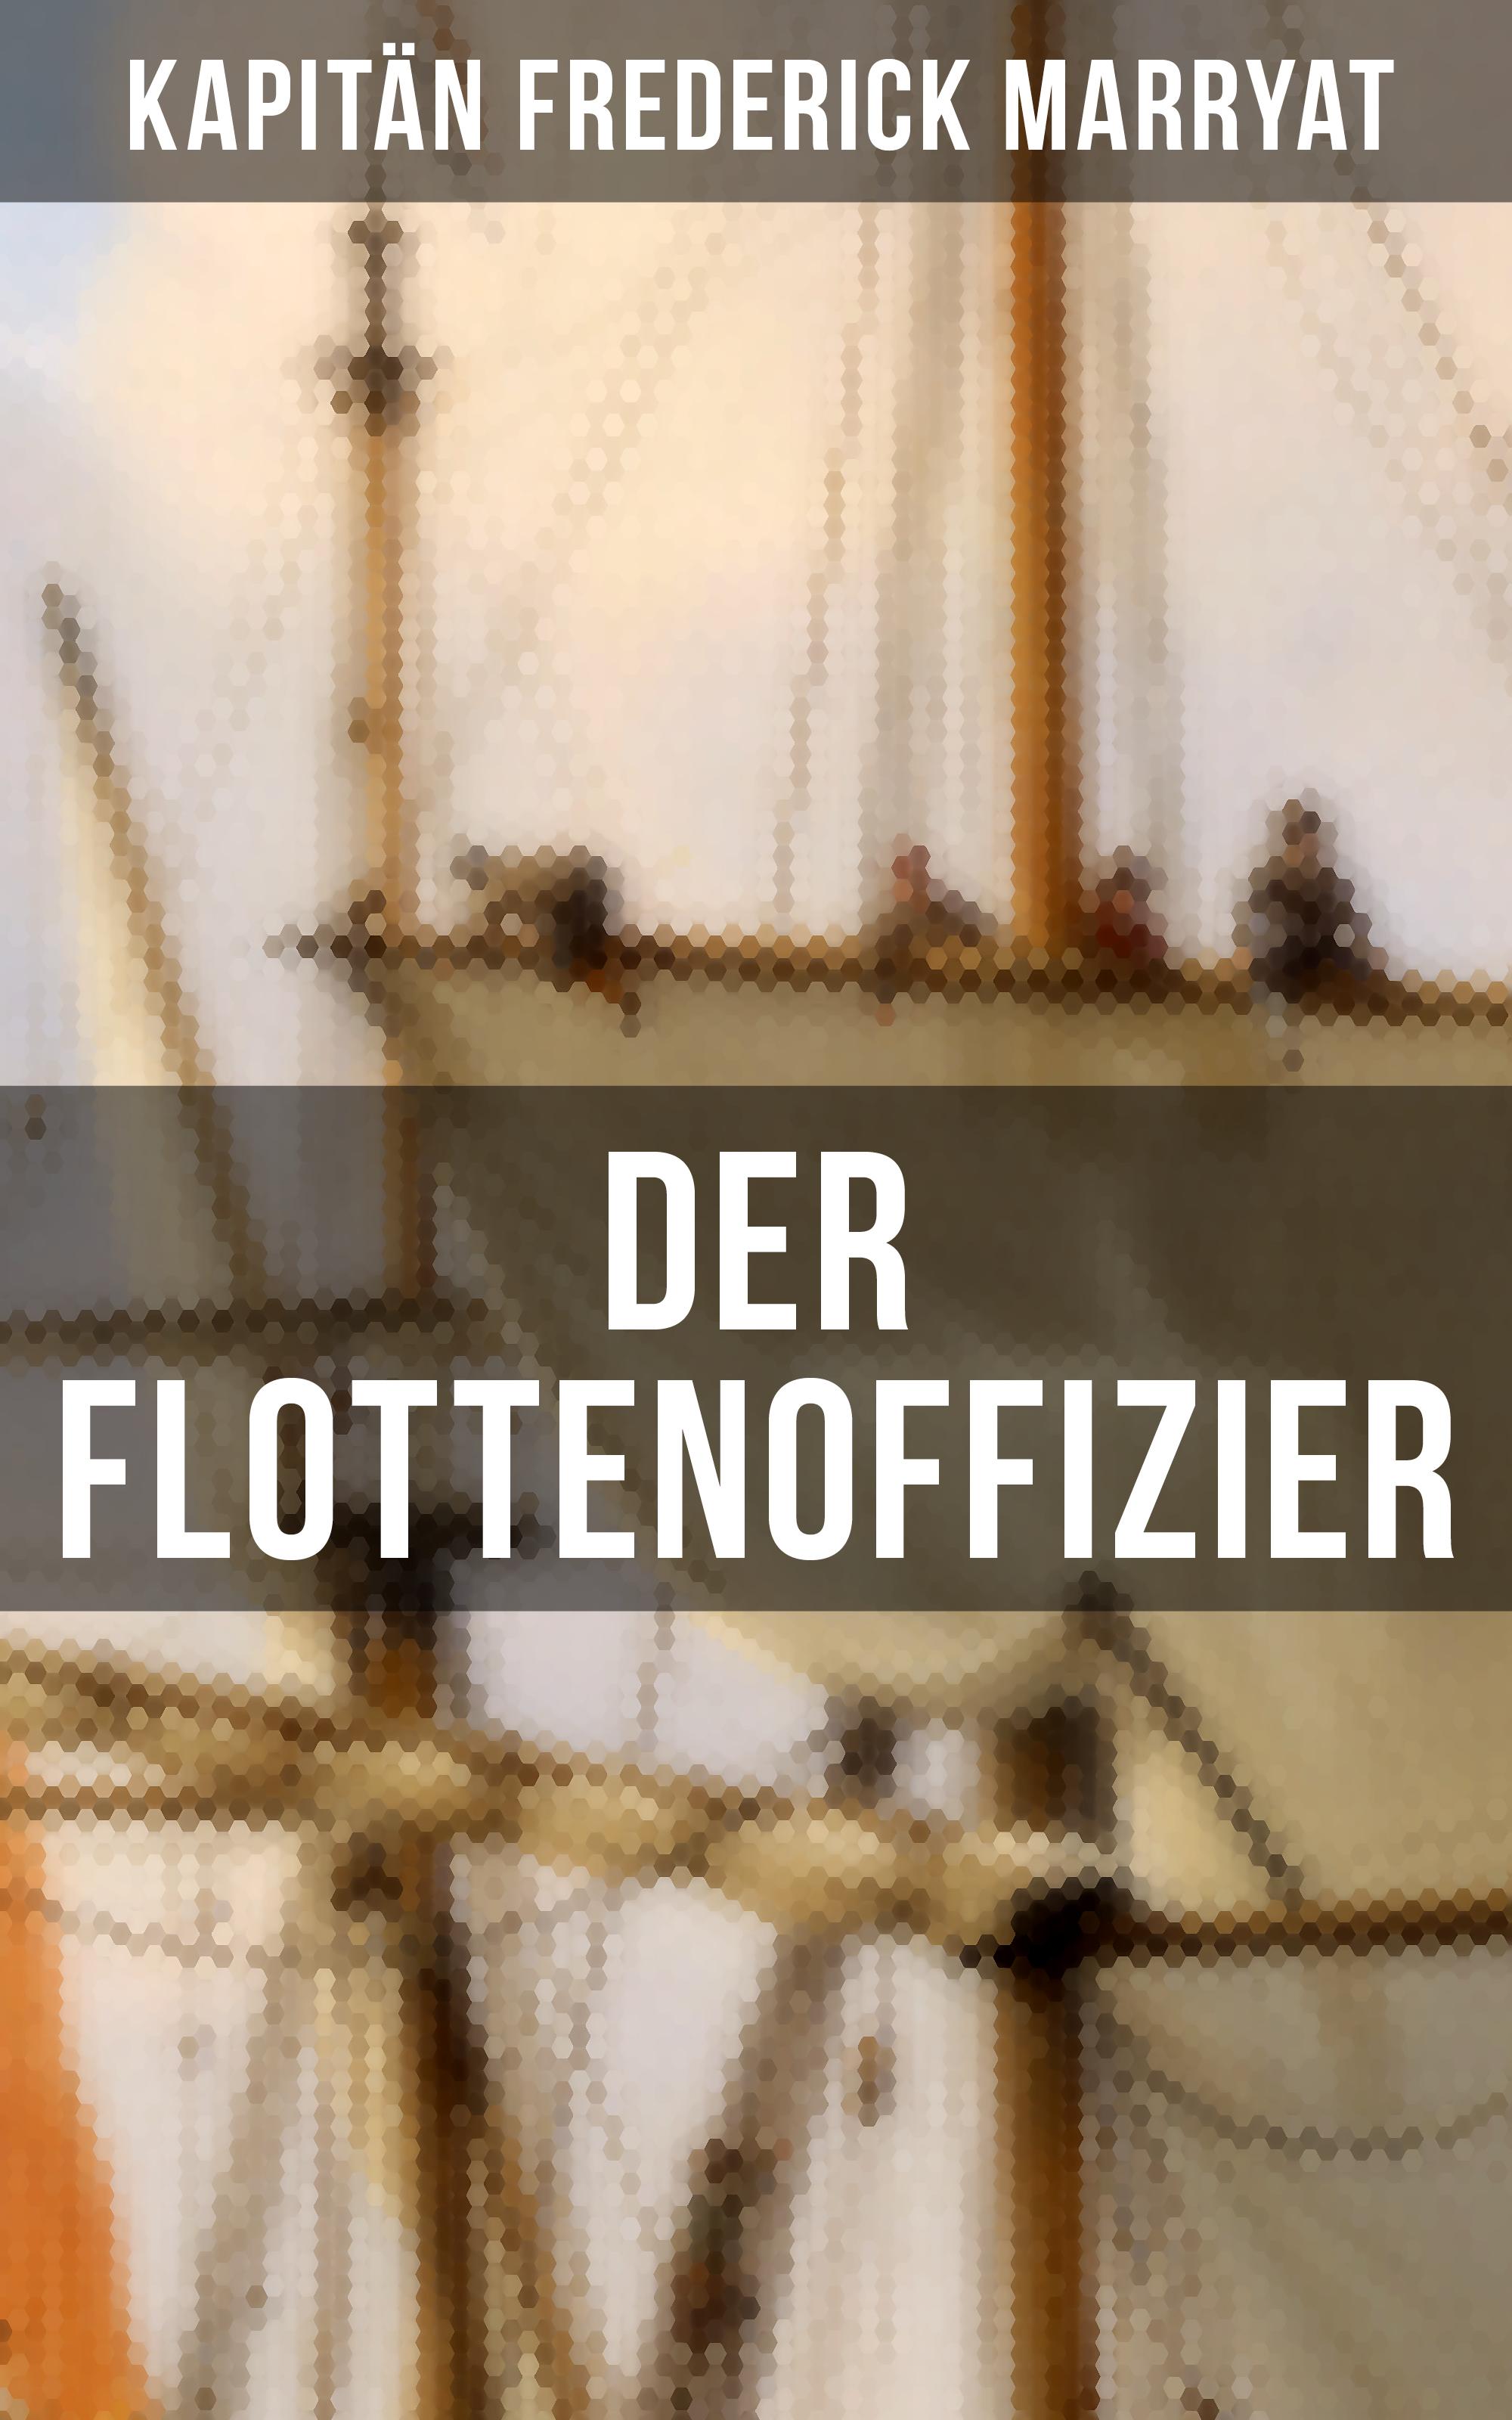 Kapitan Frederick Marryat Der Flottenoffizier